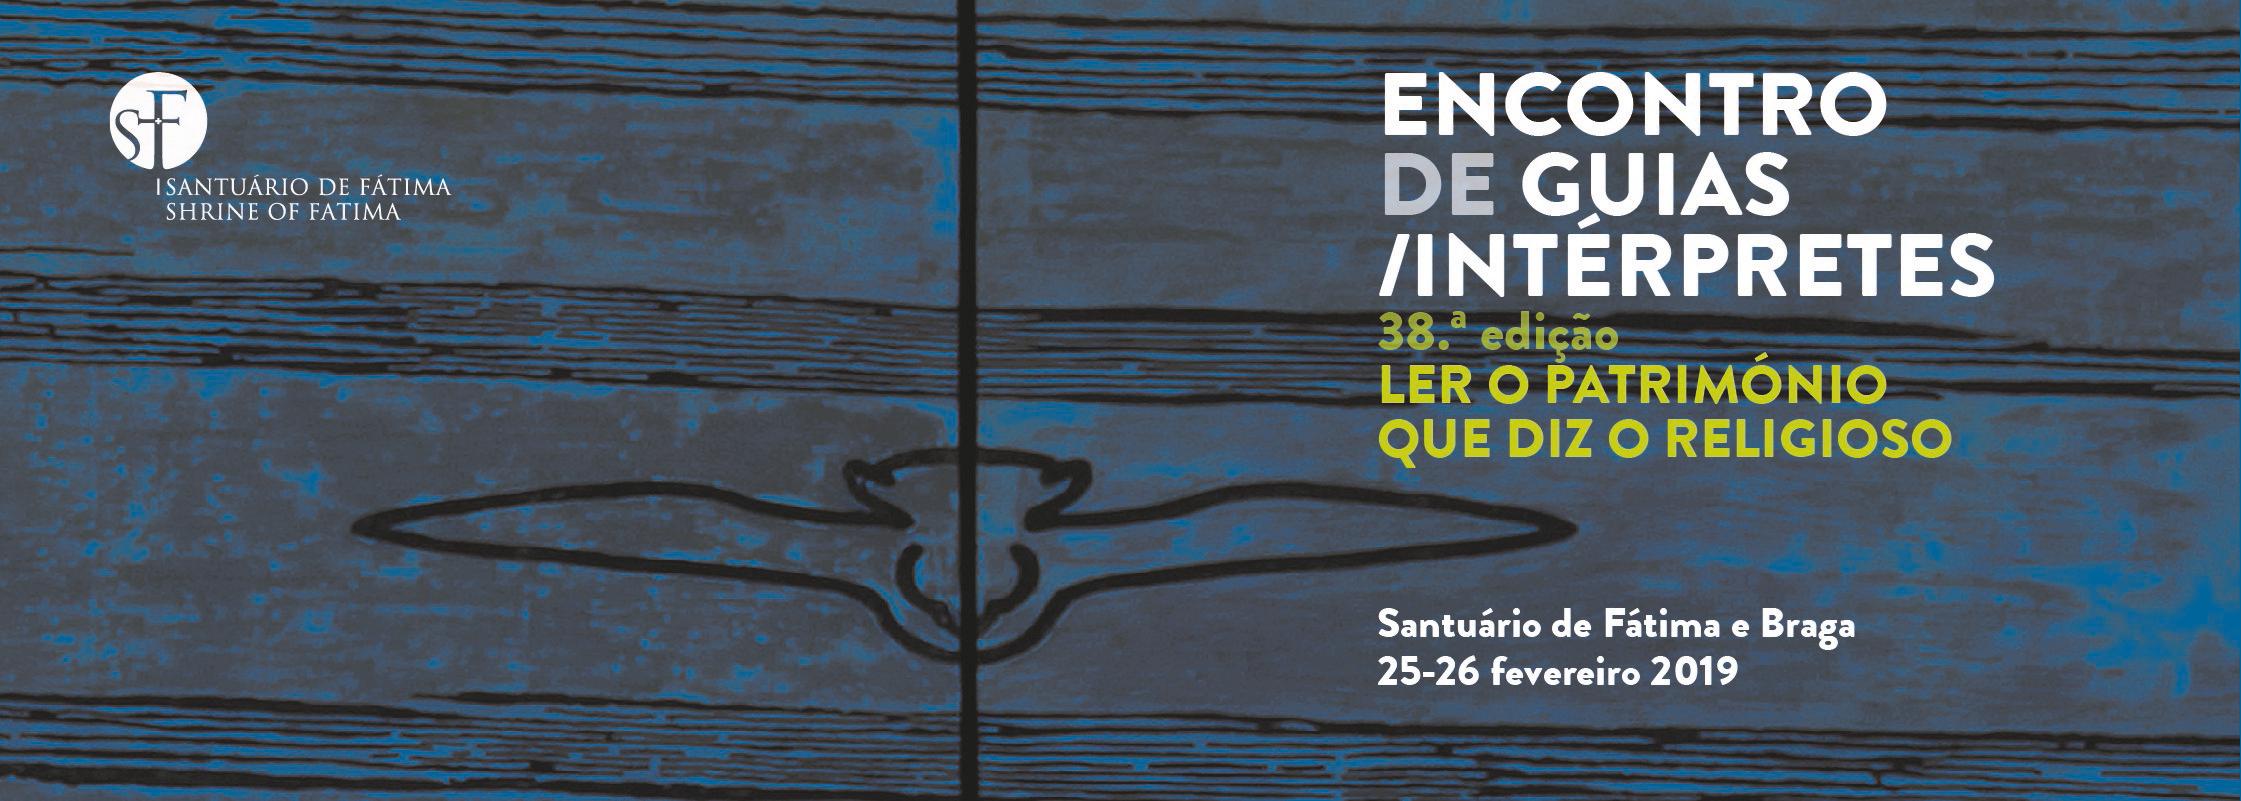 2019-01-24_guias_interpretes_banner.jpg